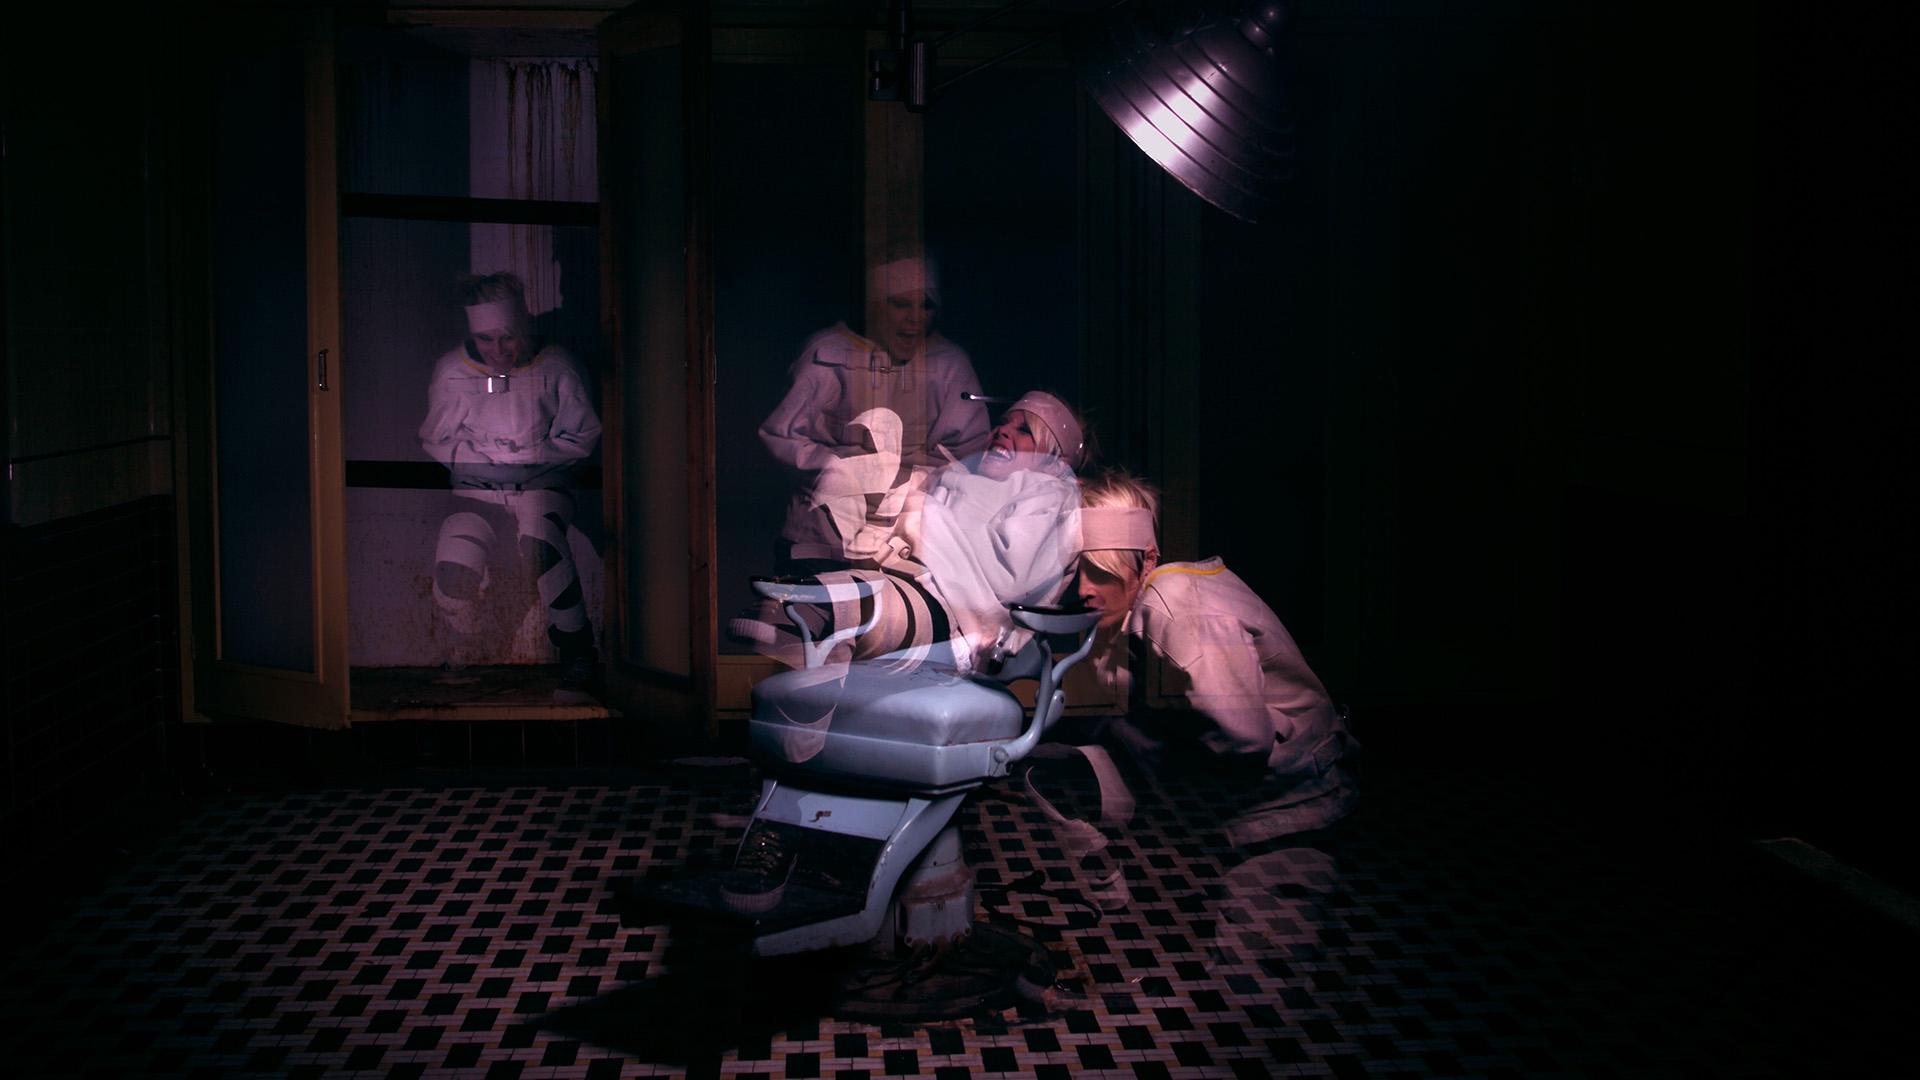 Wallpaper : night, shadow, hospital, audio, Otep, midnight ... - photo#26